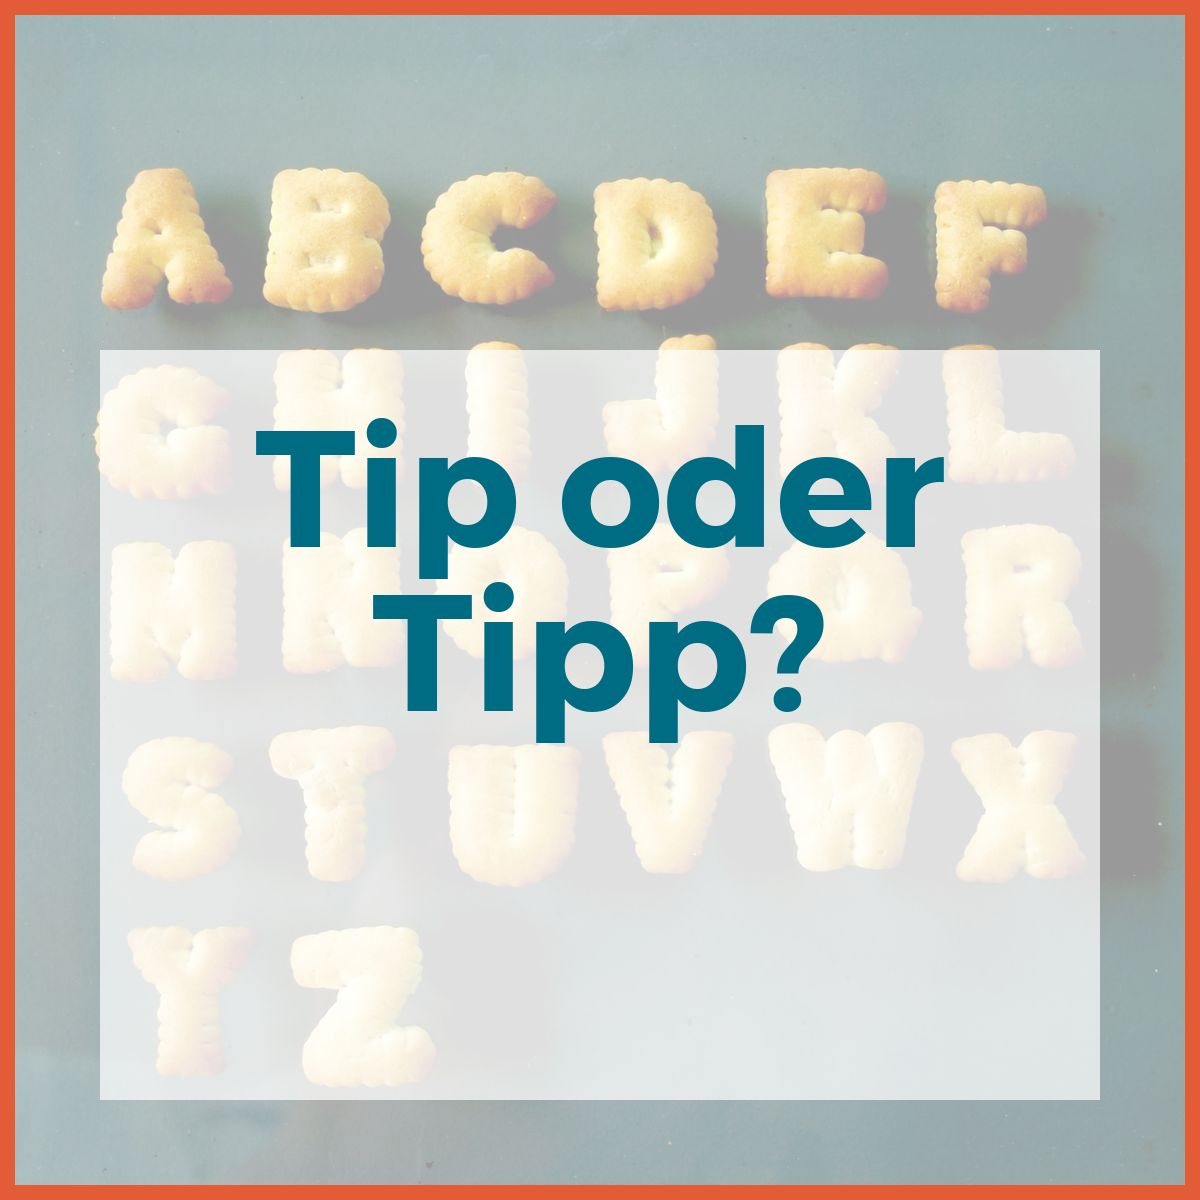 tip oder tipp